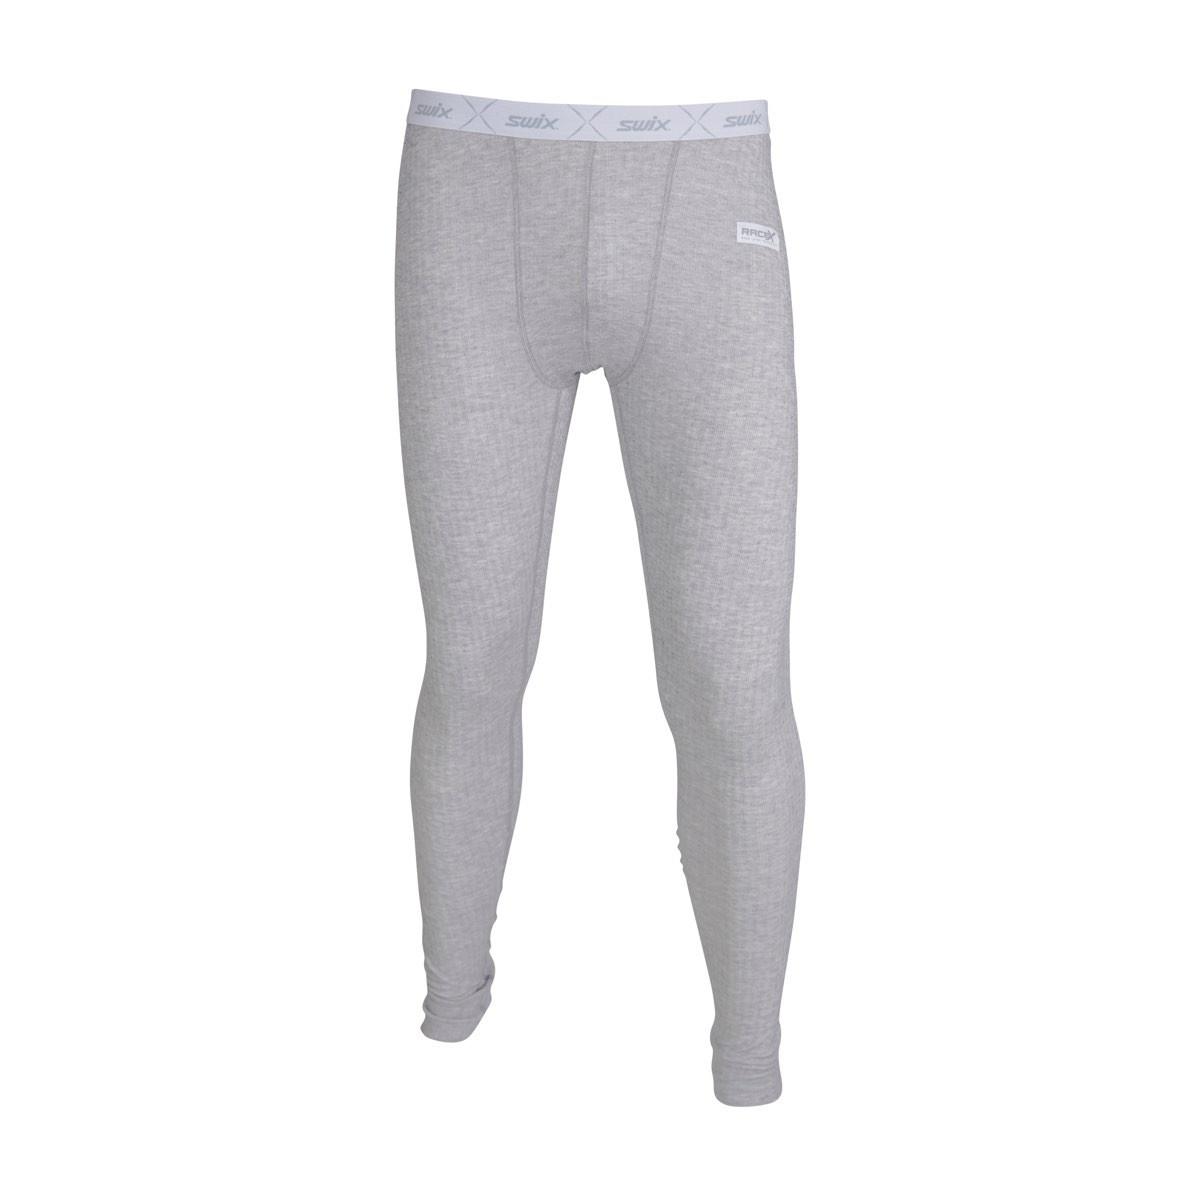 d33647ab Swix Racex Bodyw Pants Mens Grey Melange | Fjellsport.no